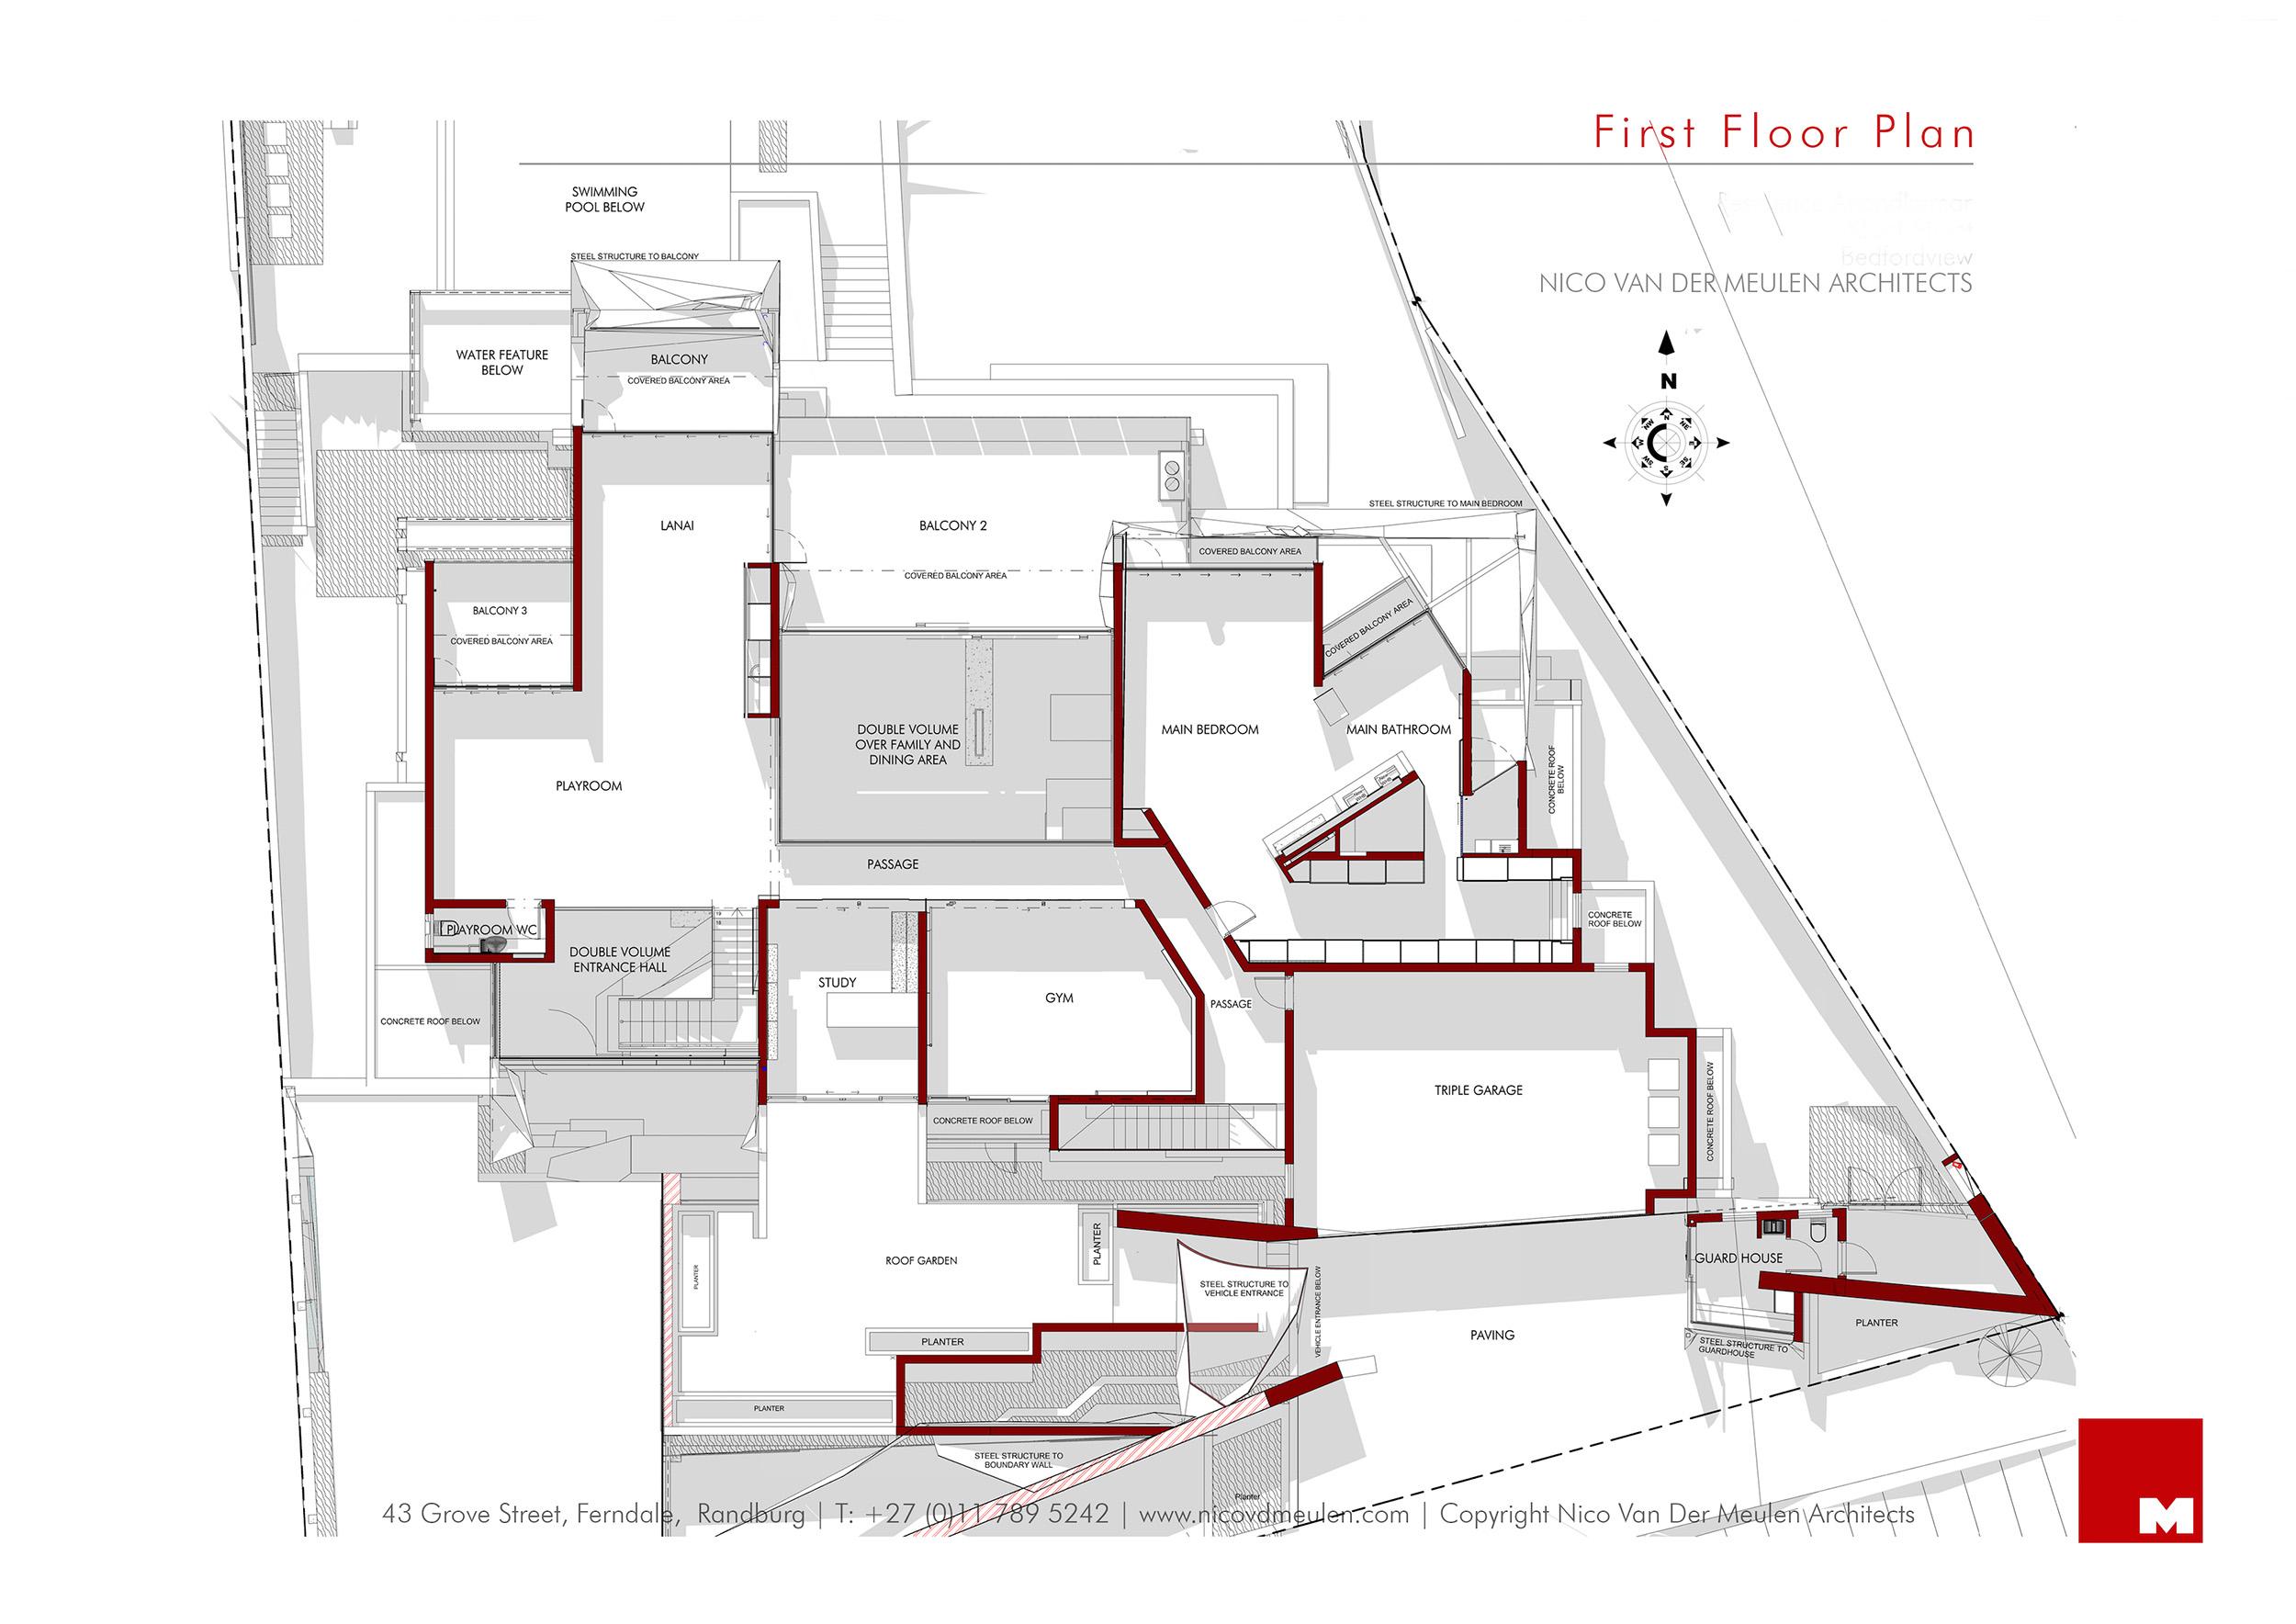 Kloof Road Masterpiece House in Johannesburg by Nico van der Meulen Architects-41